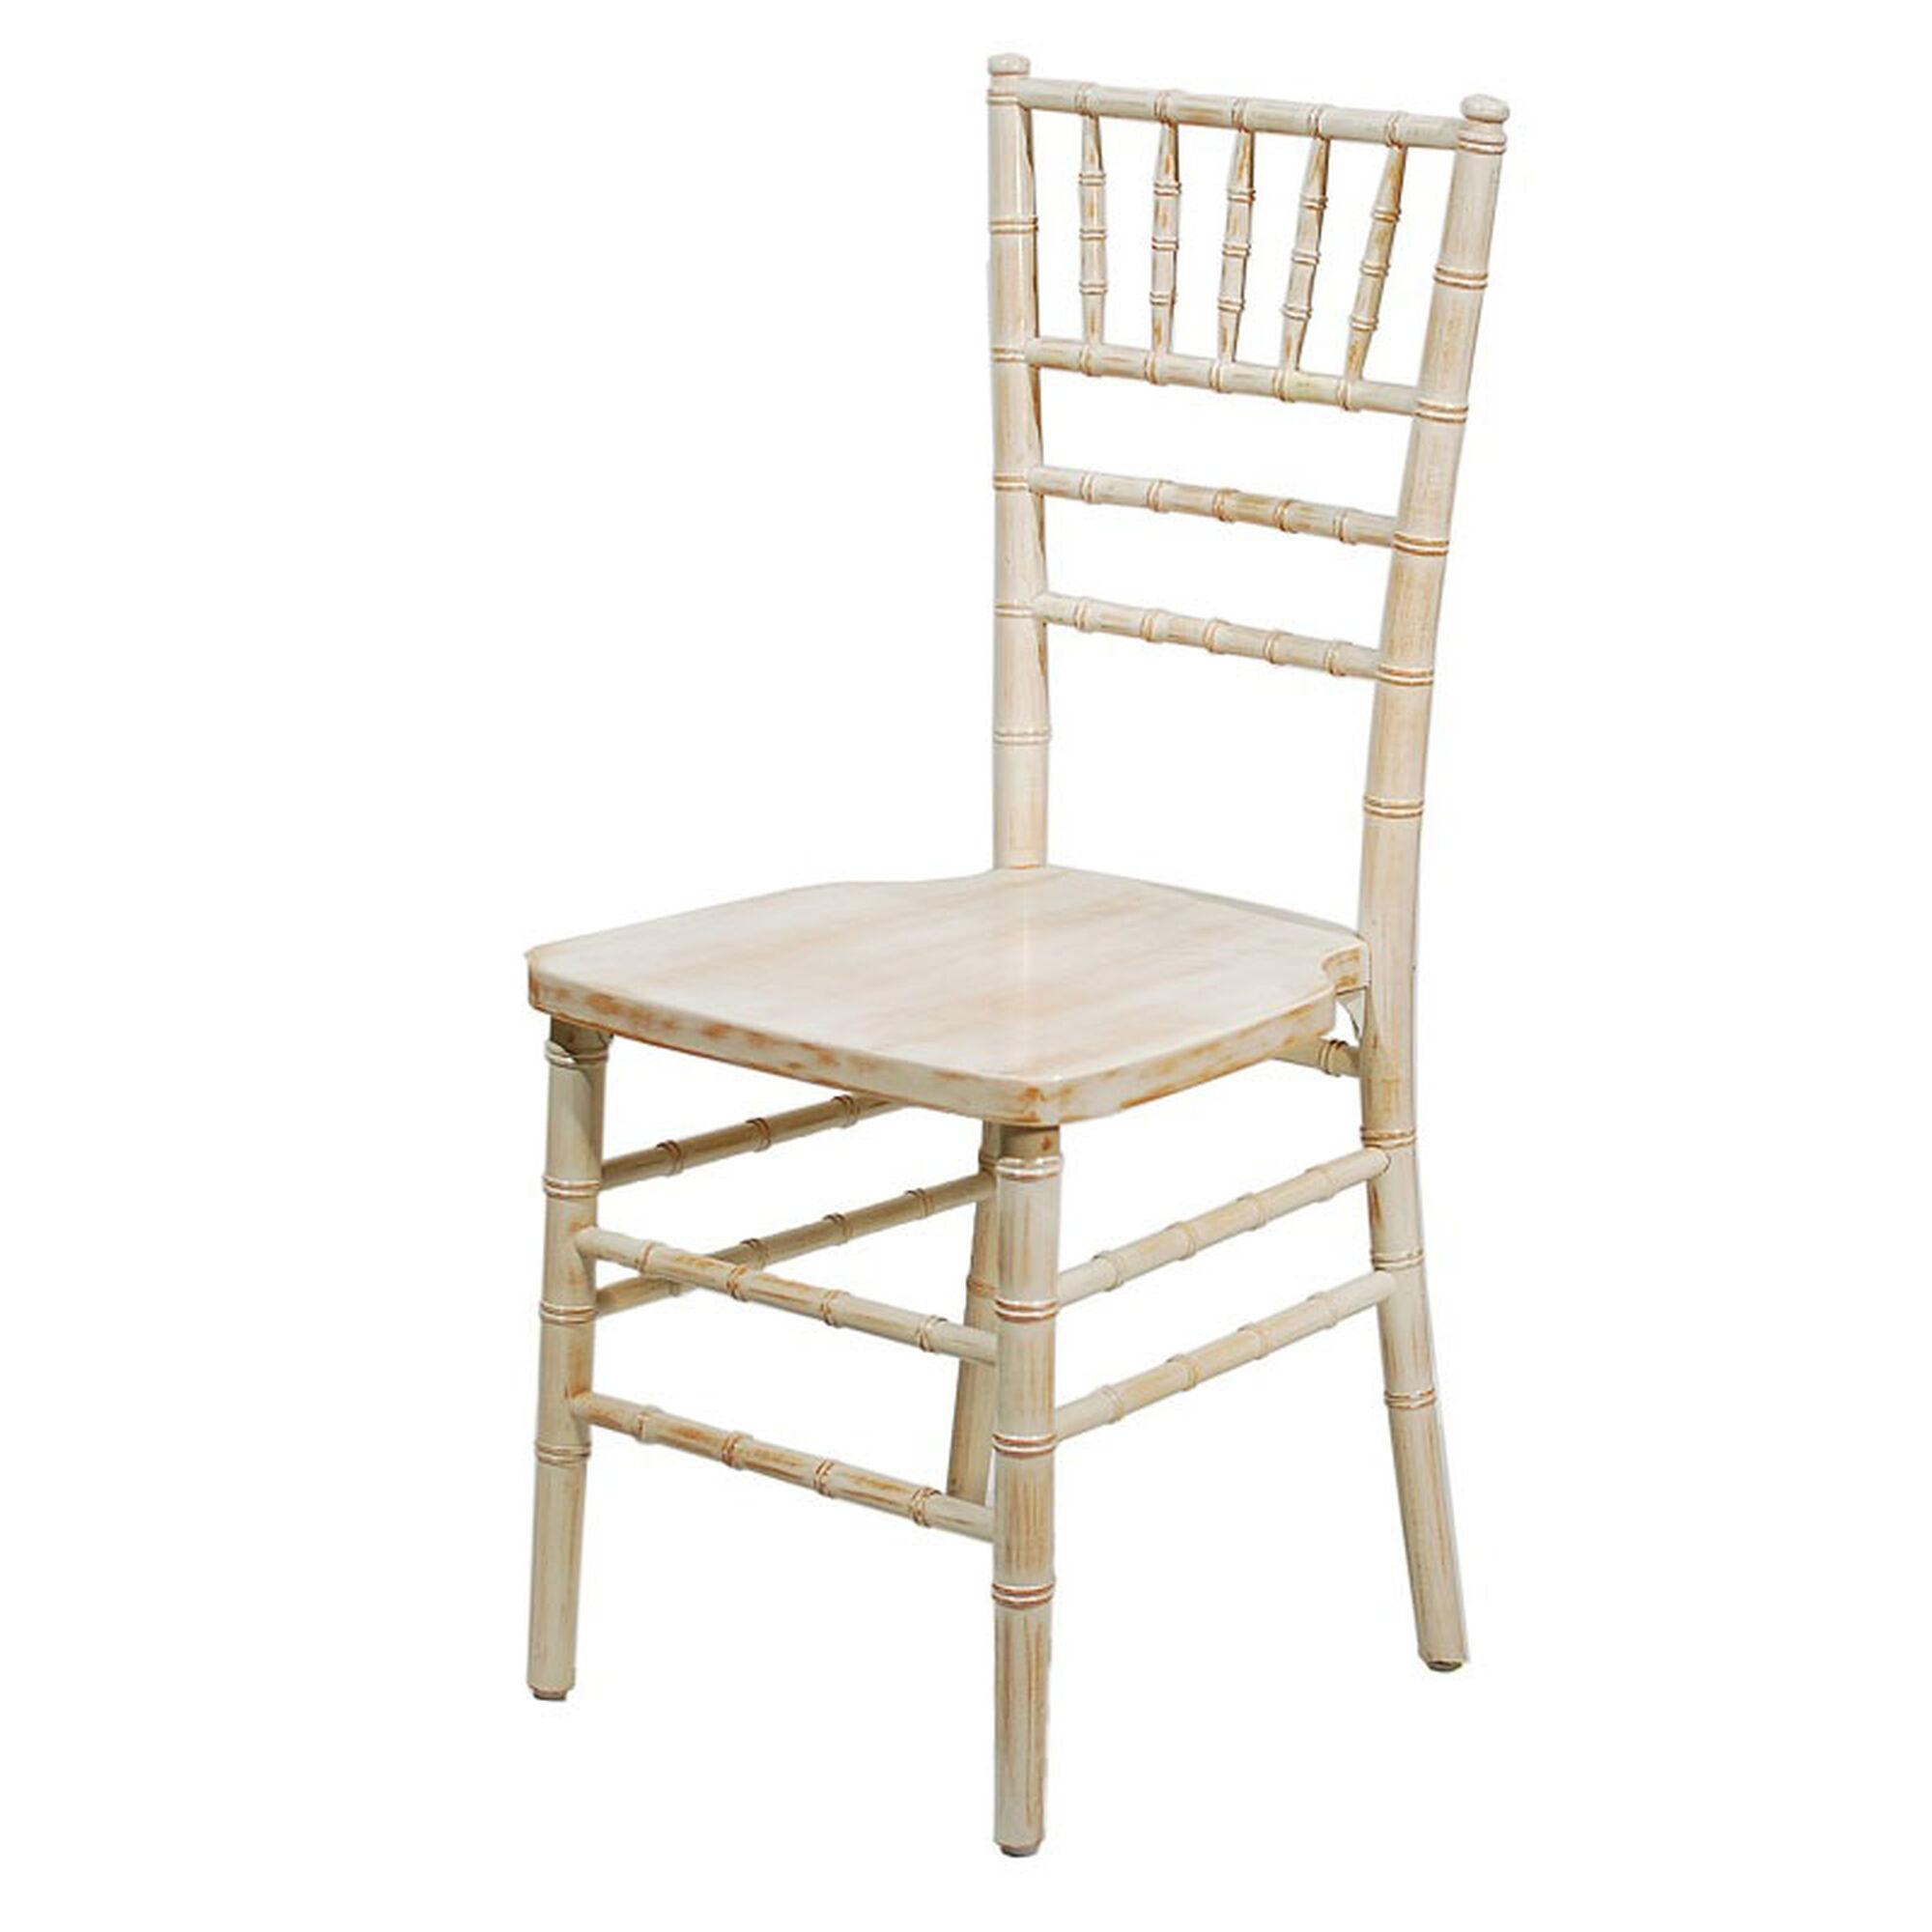 premier furniture events chairs limewash leicester items wedding london chivari chiavari inspiration in chair hire stock